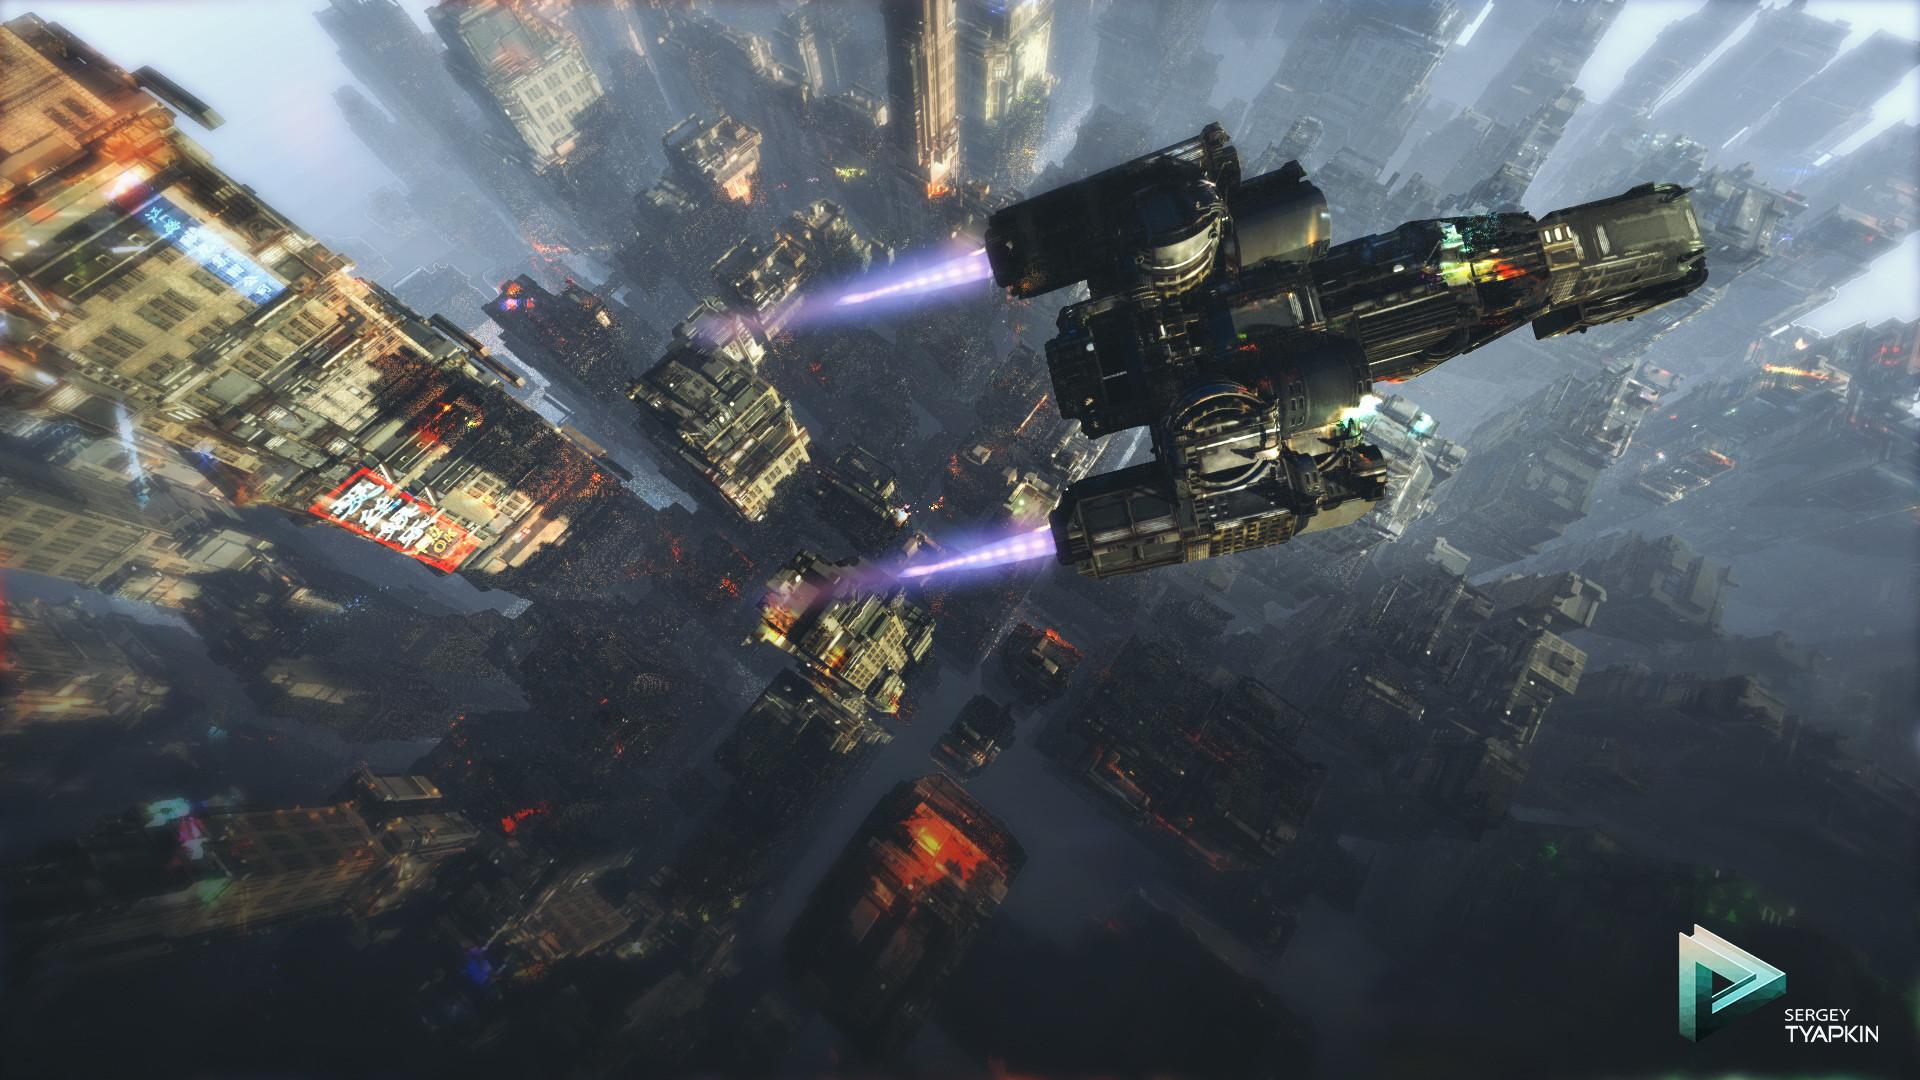 Sergey tyapkin scifi city concept scene 01